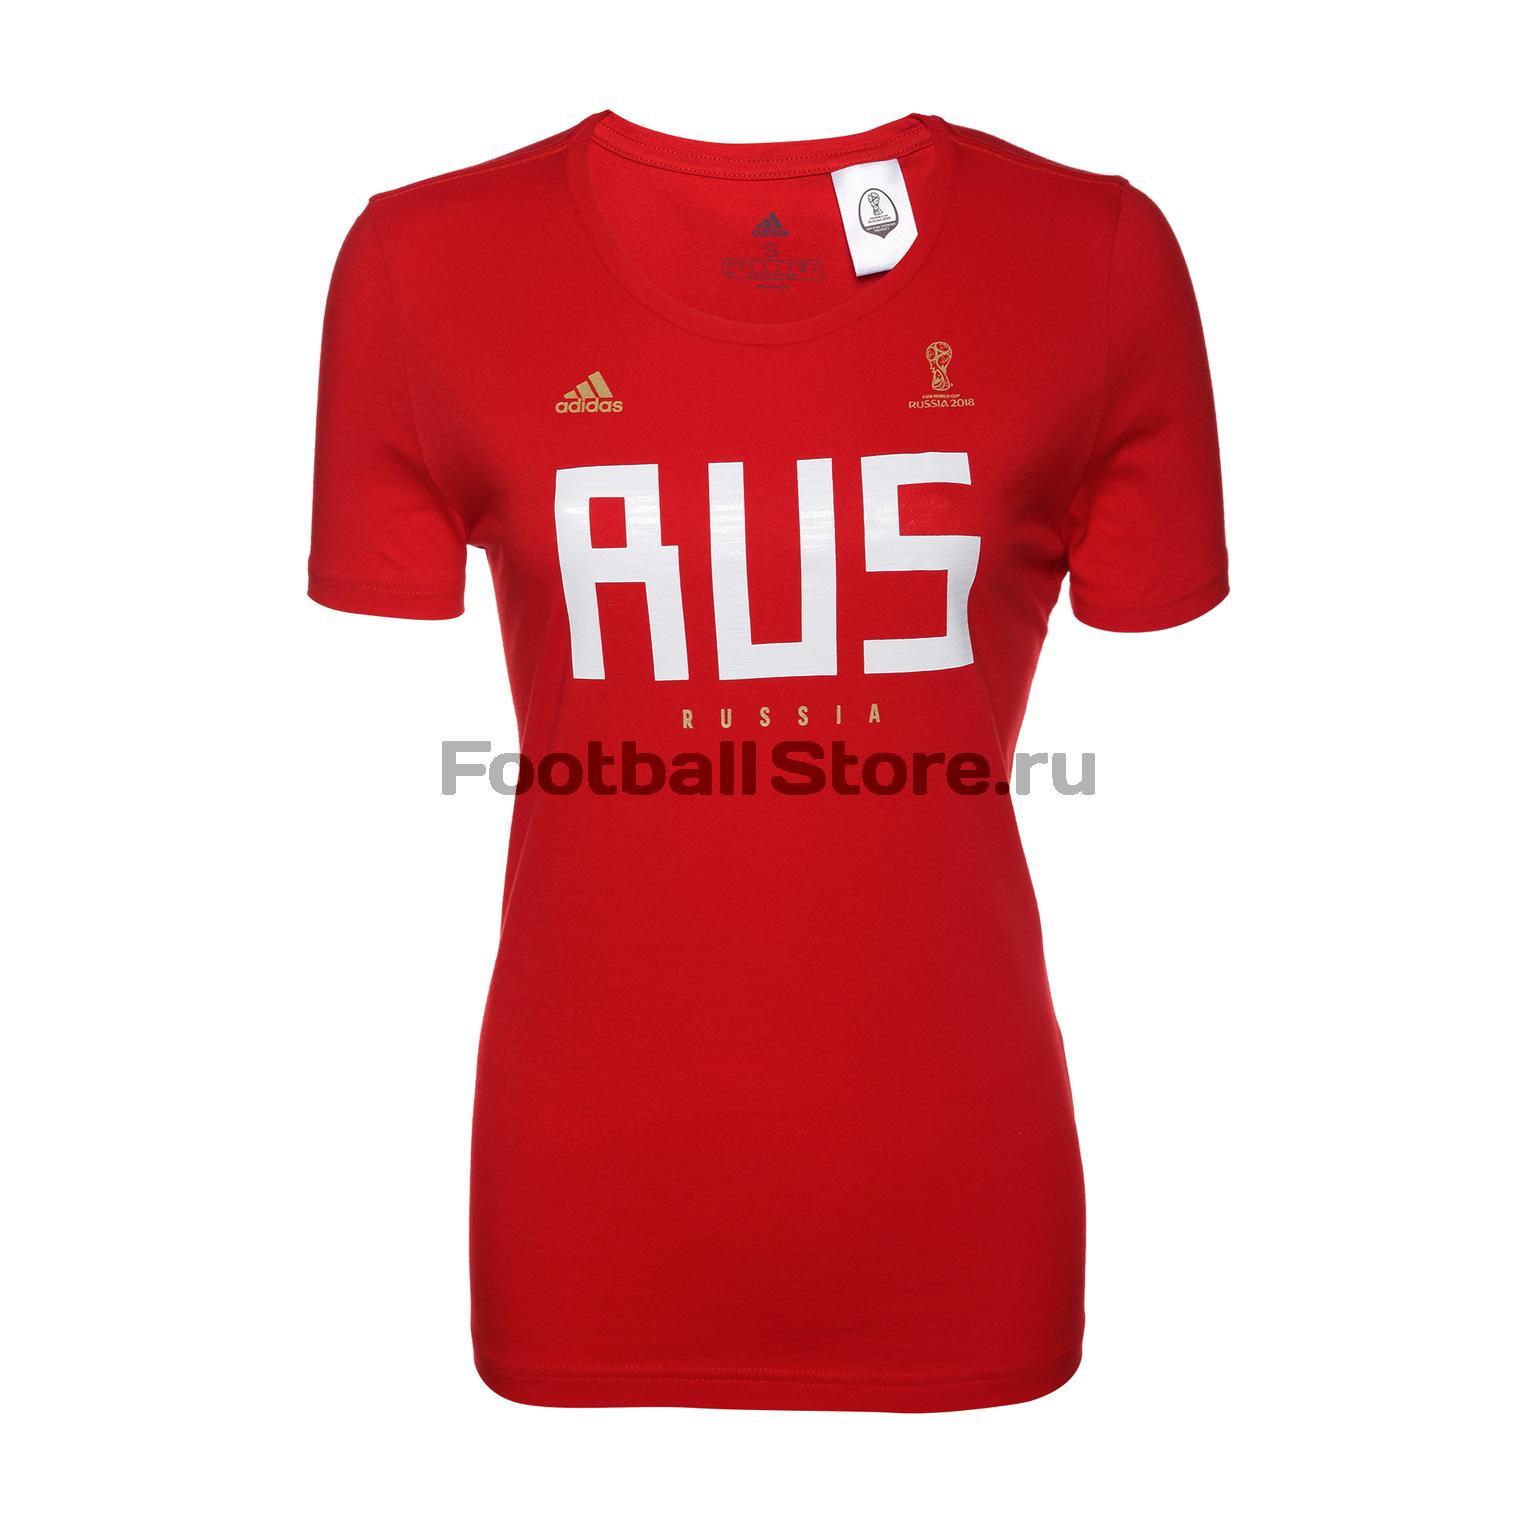 Футболка женская Adidas Russia Wns CW2077 adidas adidas russia 3 stripes cap